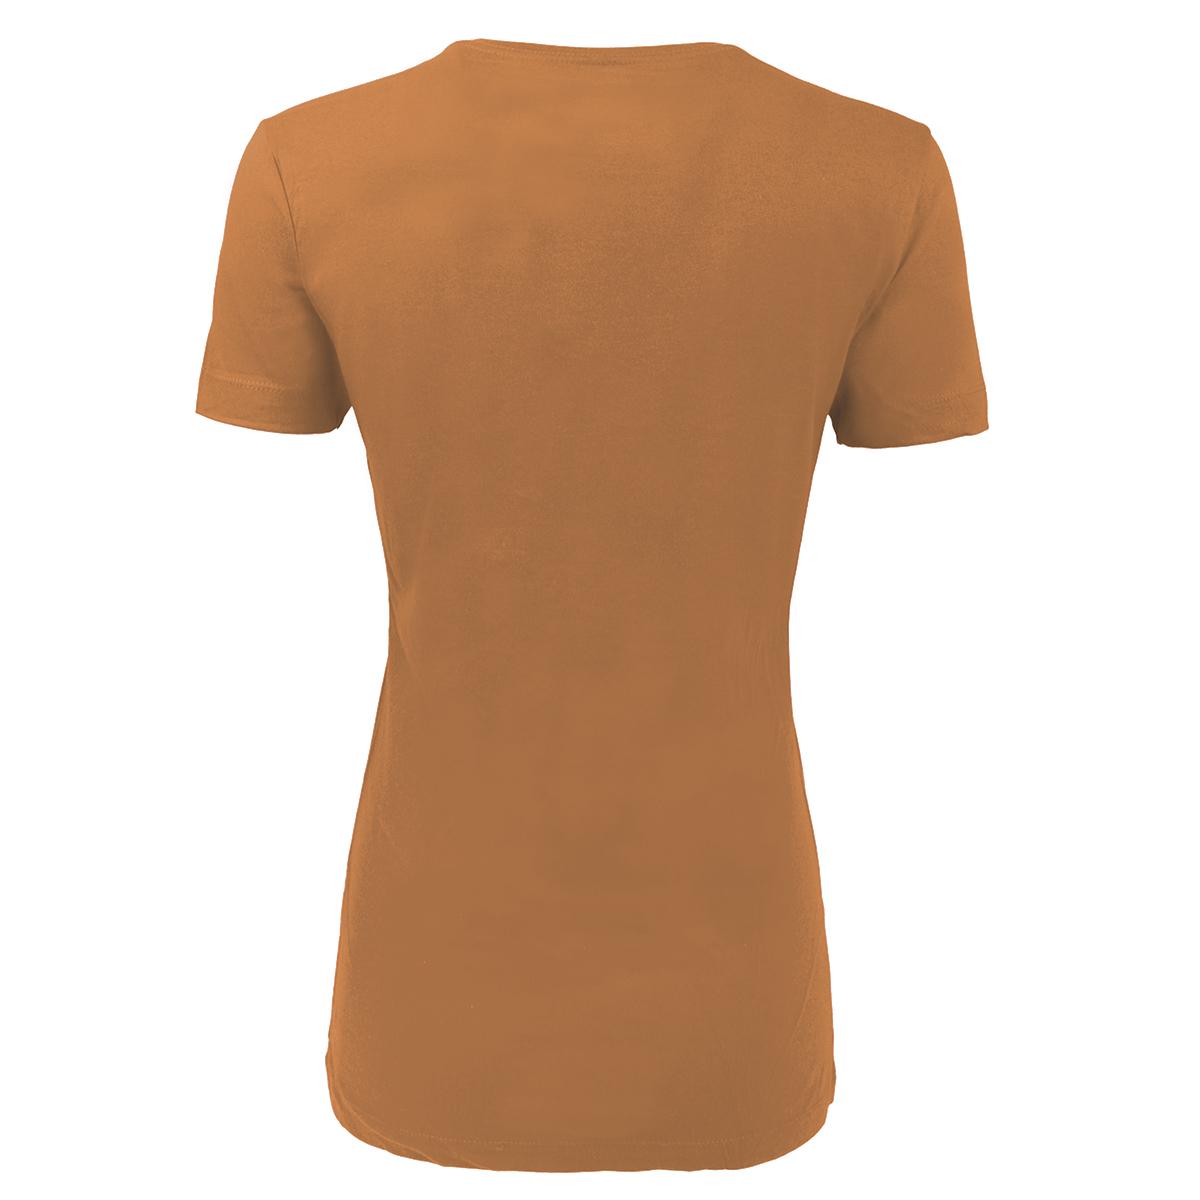 Nike-Women-039-s-Cotton-Slim-Fit-T-Shirt thumbnail 21